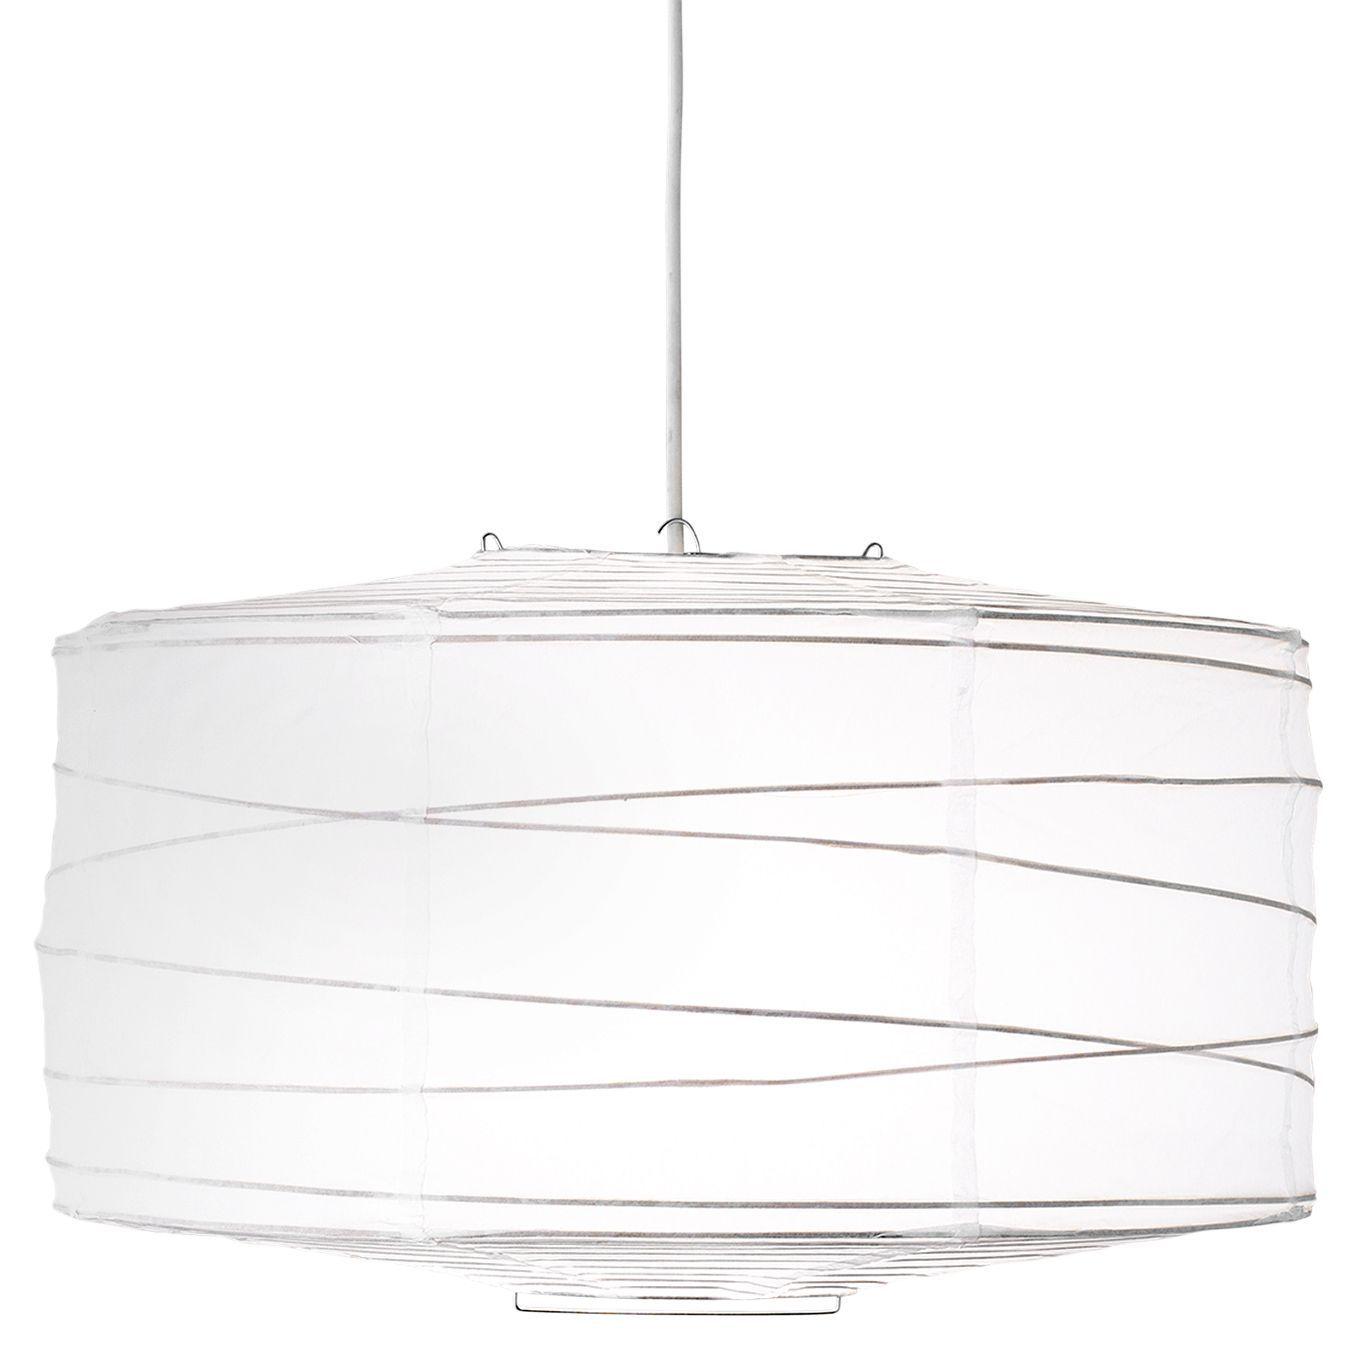 Lights By B&Q Shimada White Rice Paper Light Shade (D)45cm | Departments |  DIY at B&Q.